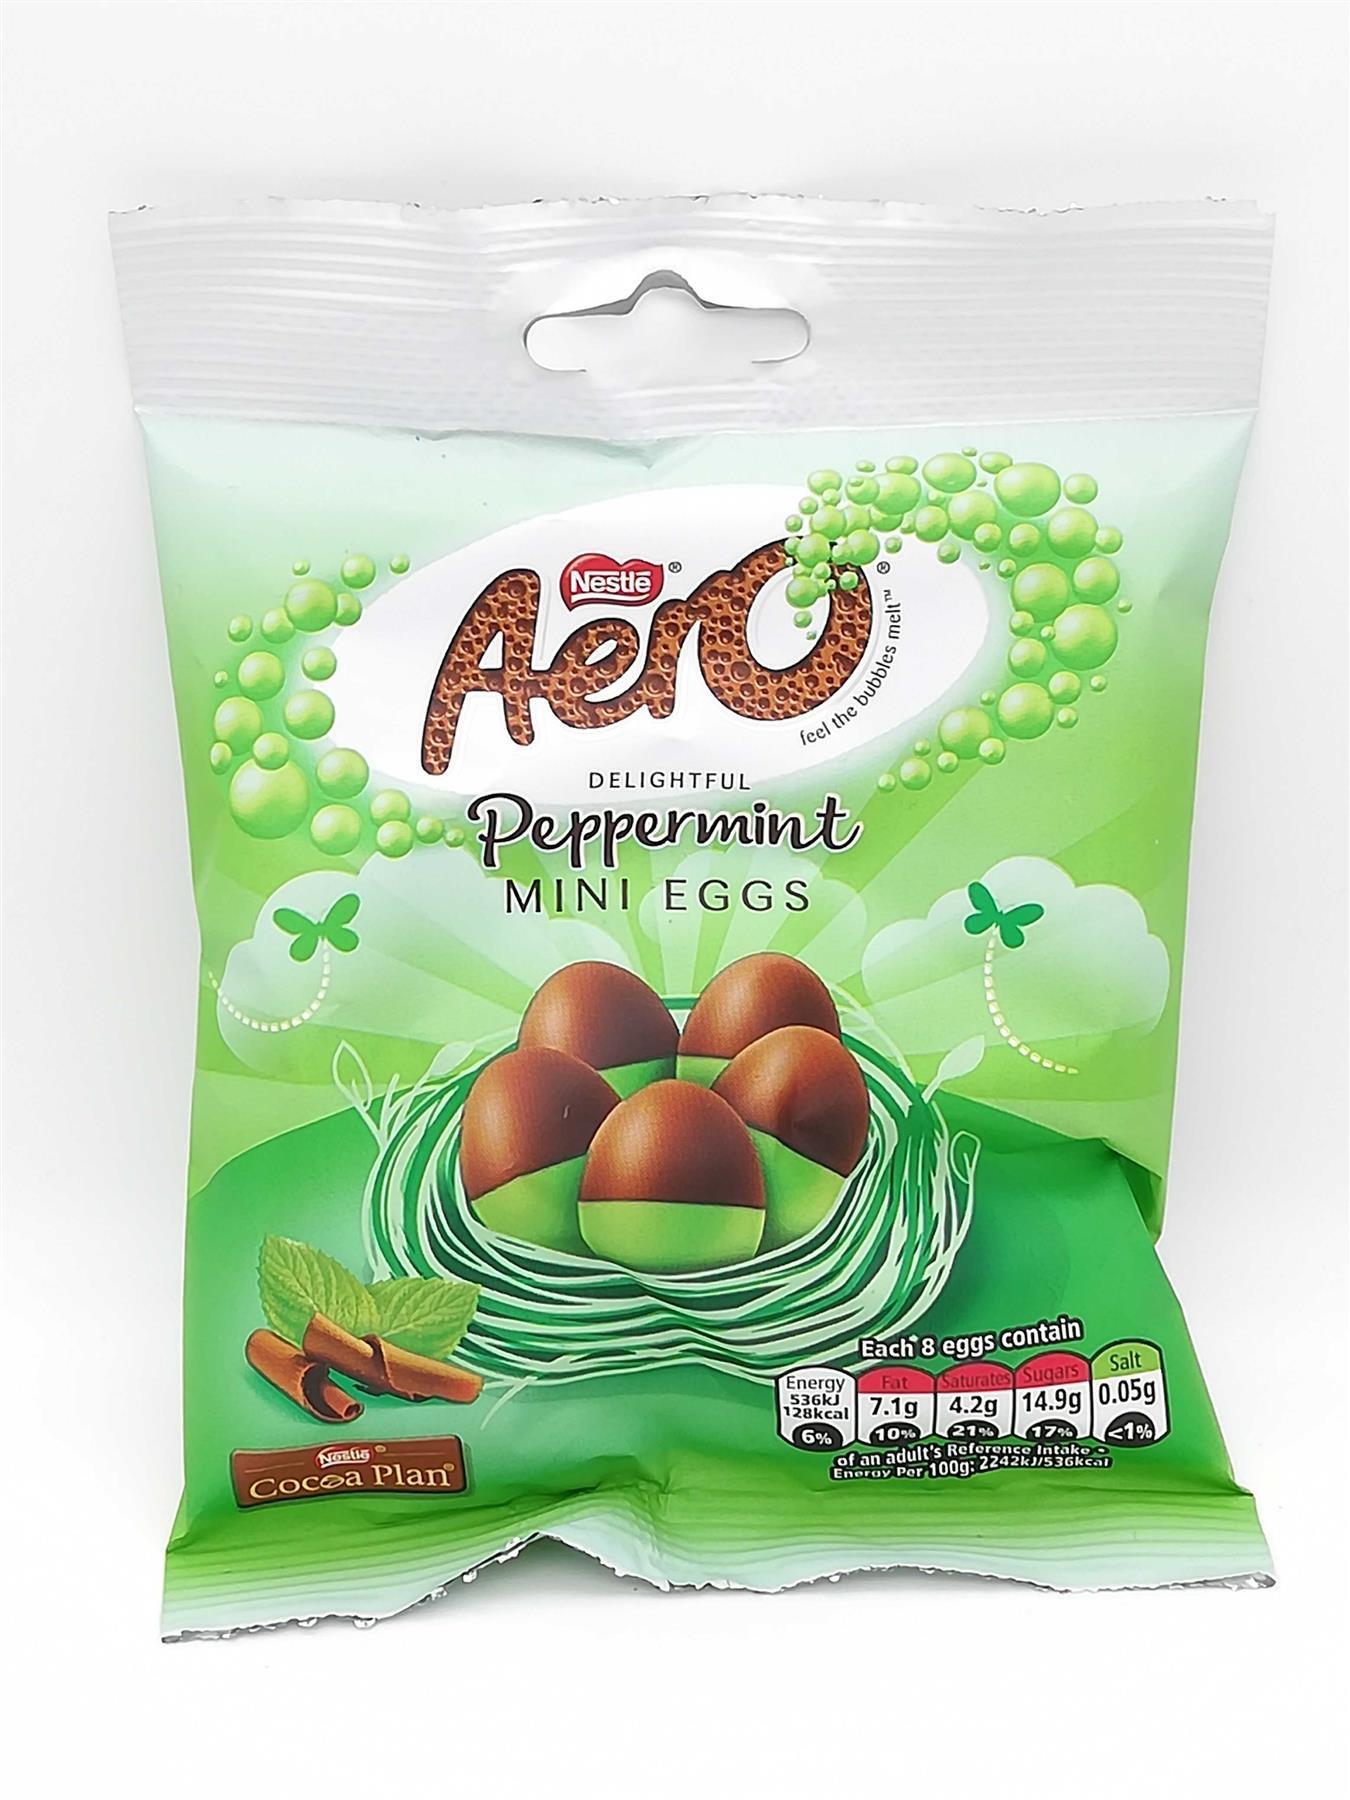 Aero Peppermint mini eggs 25p @ Tesco